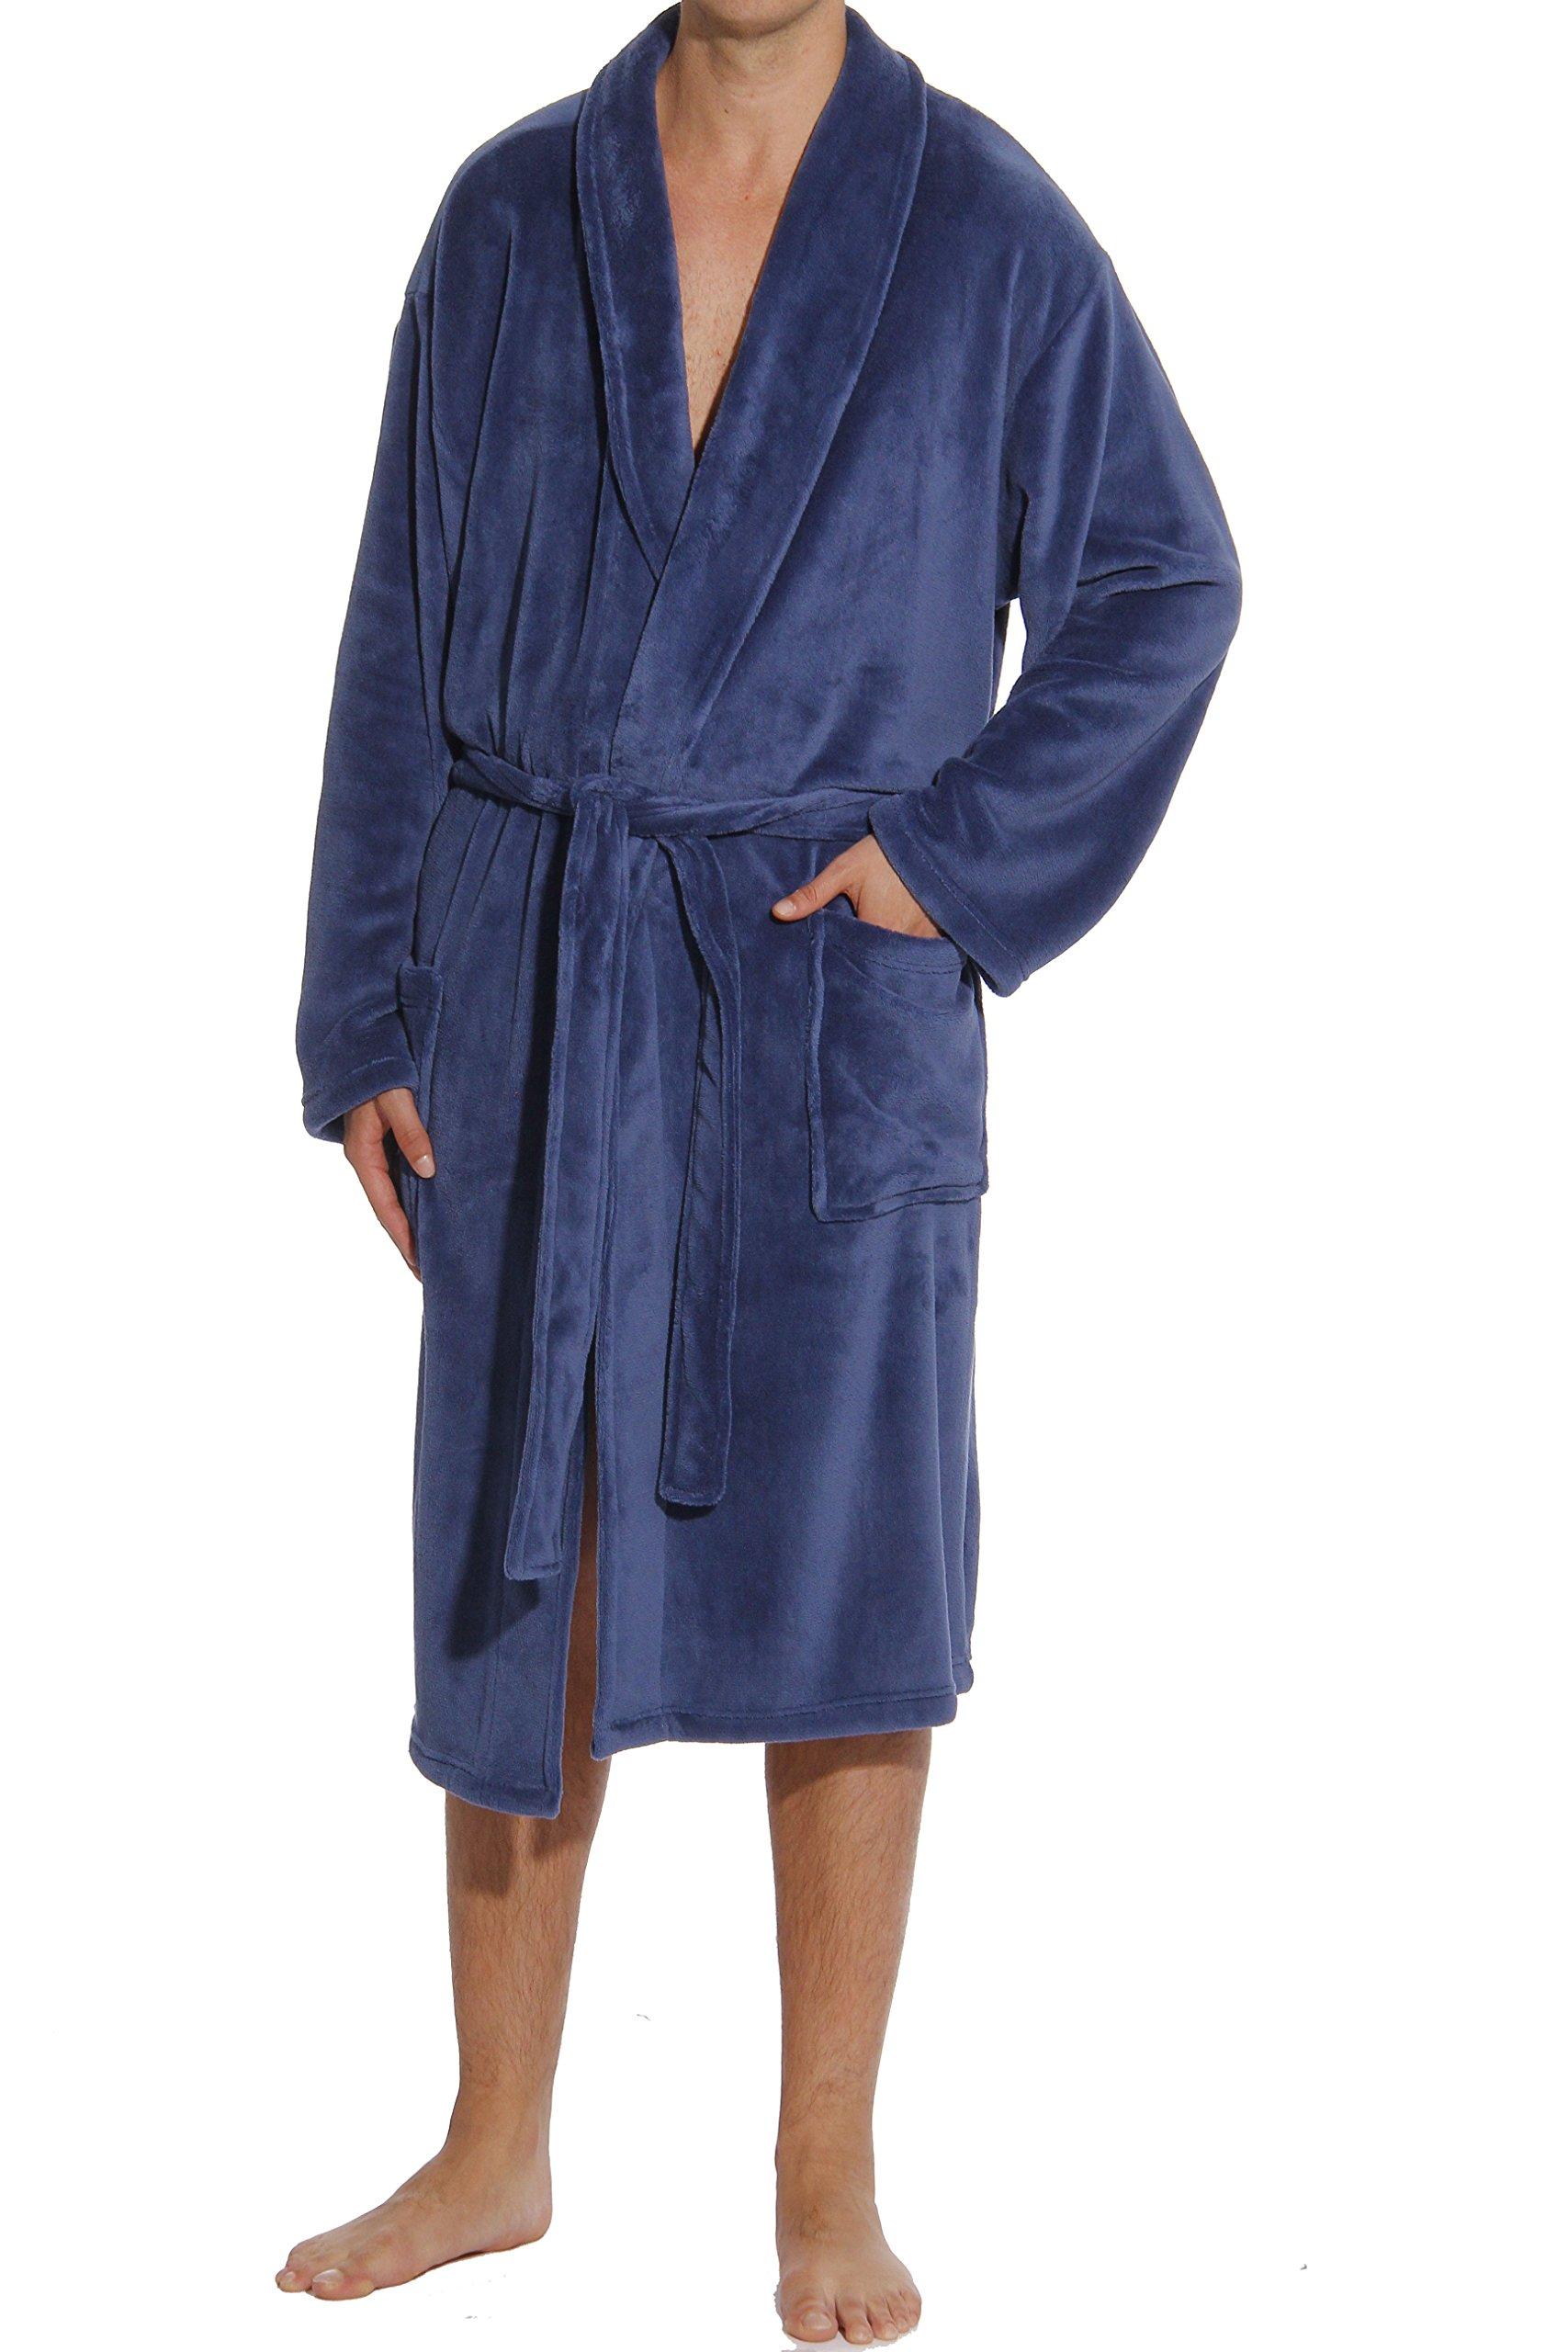 #followme 46902-NVY-L Plush Robe Robes For Men